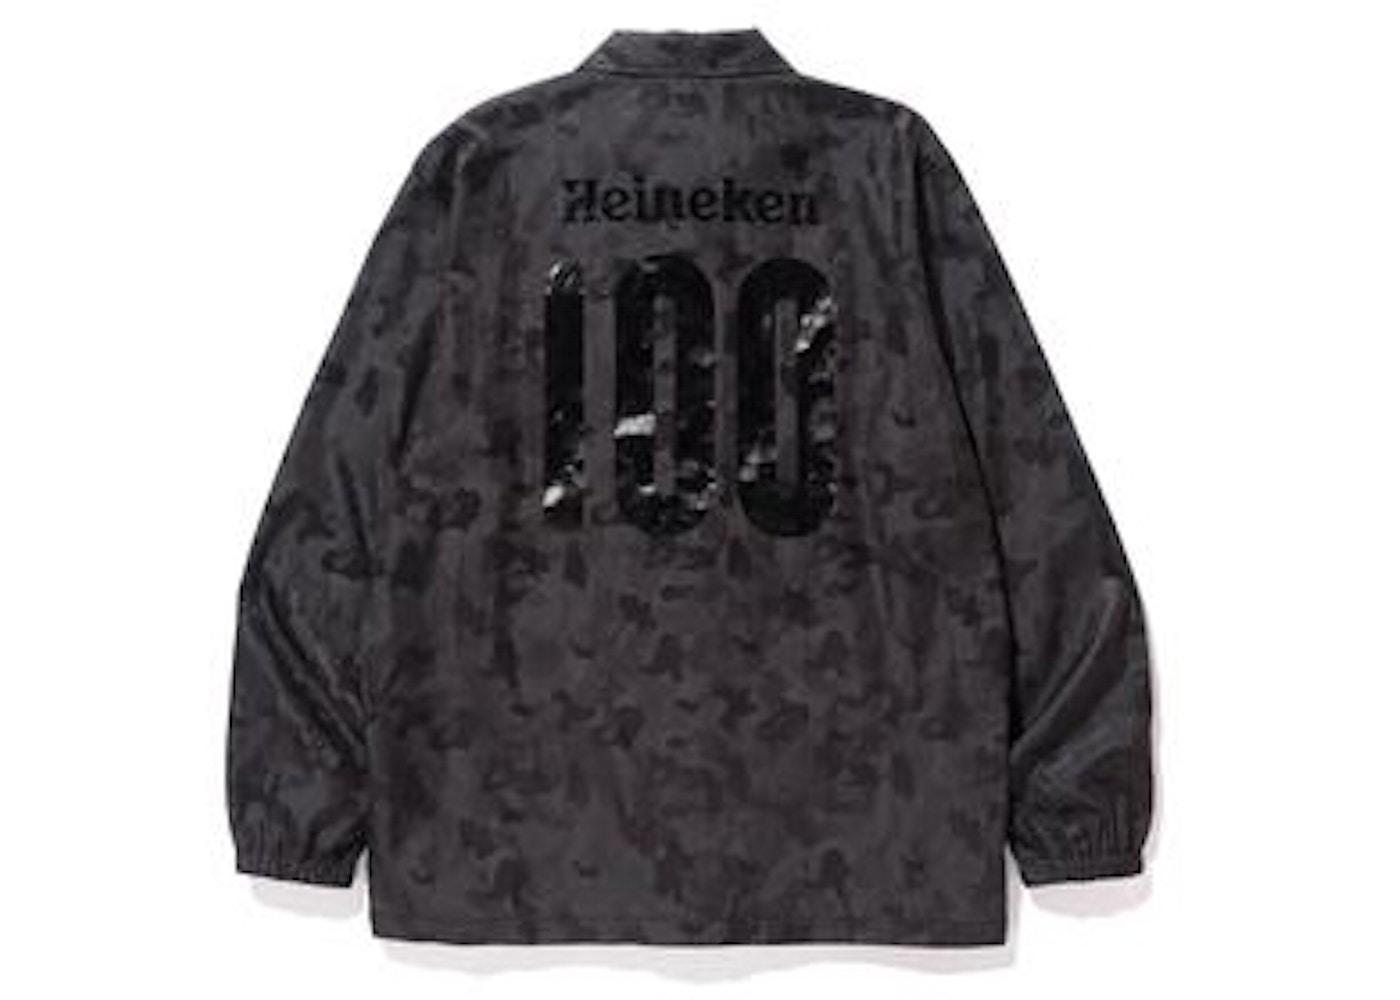 5e9bc7541e90 Streetwear - Bape Jackets - Volatility